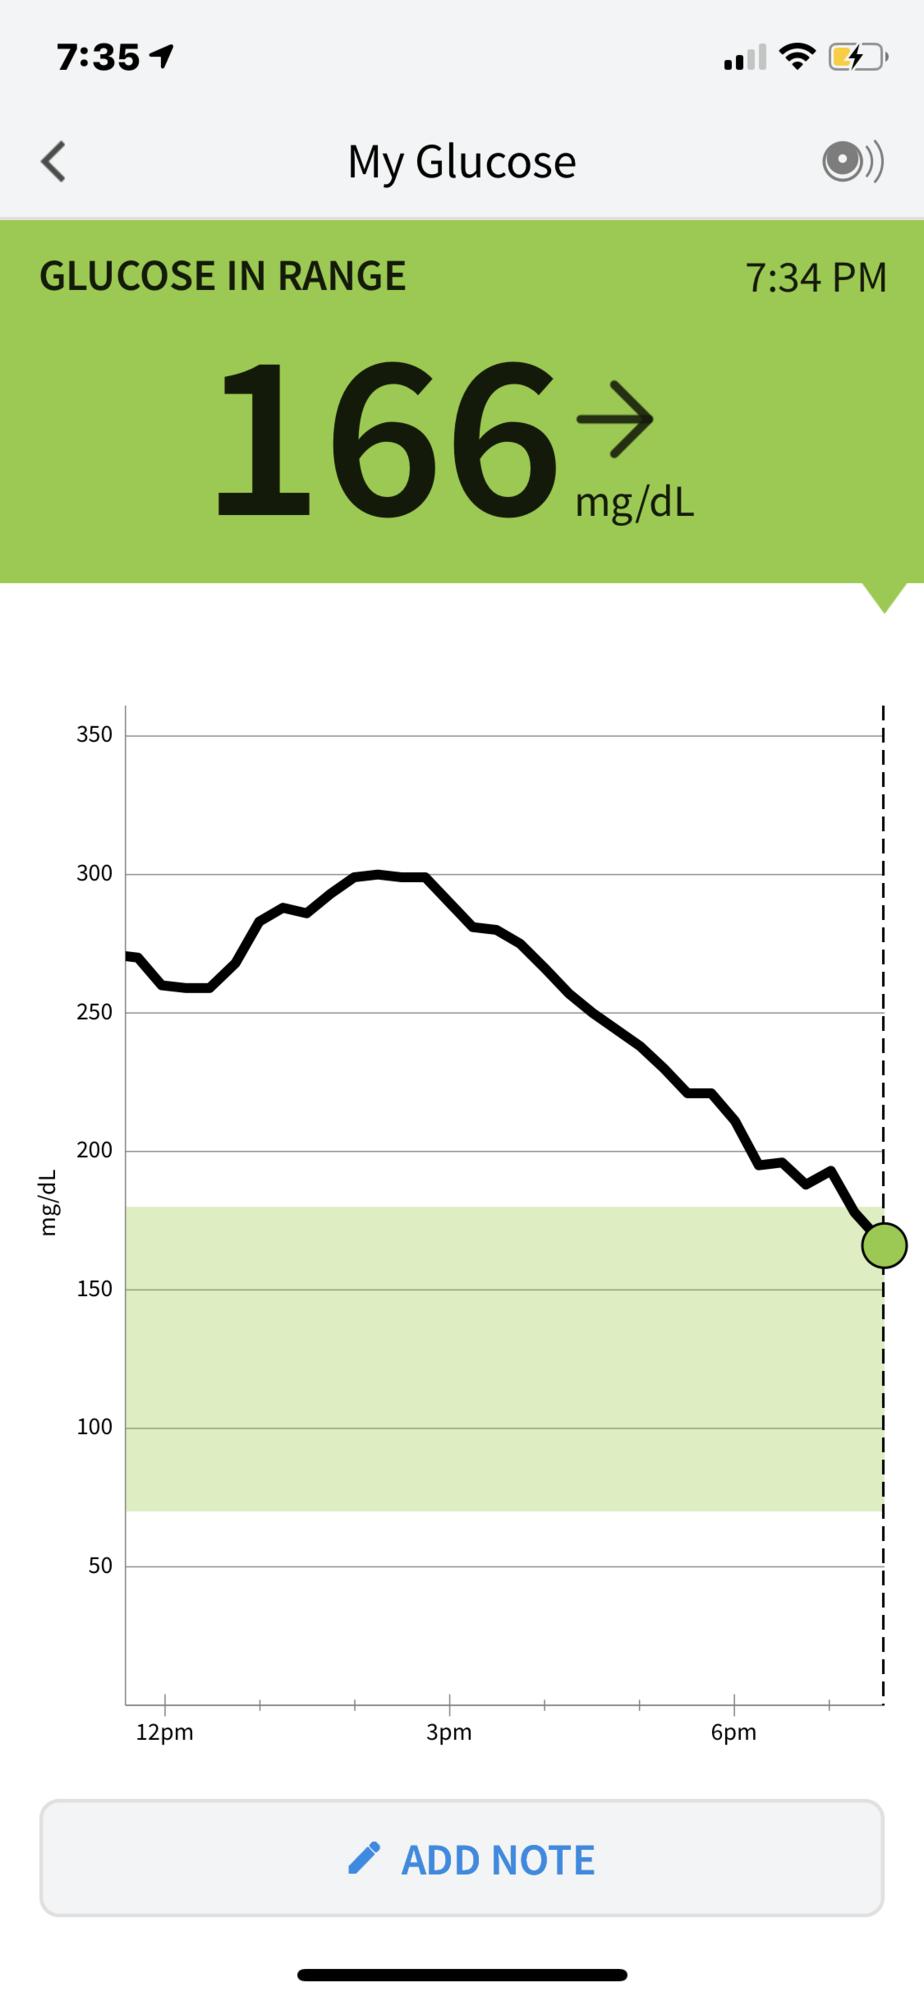 Freestyle Libre Sensor at 166 mg/dL